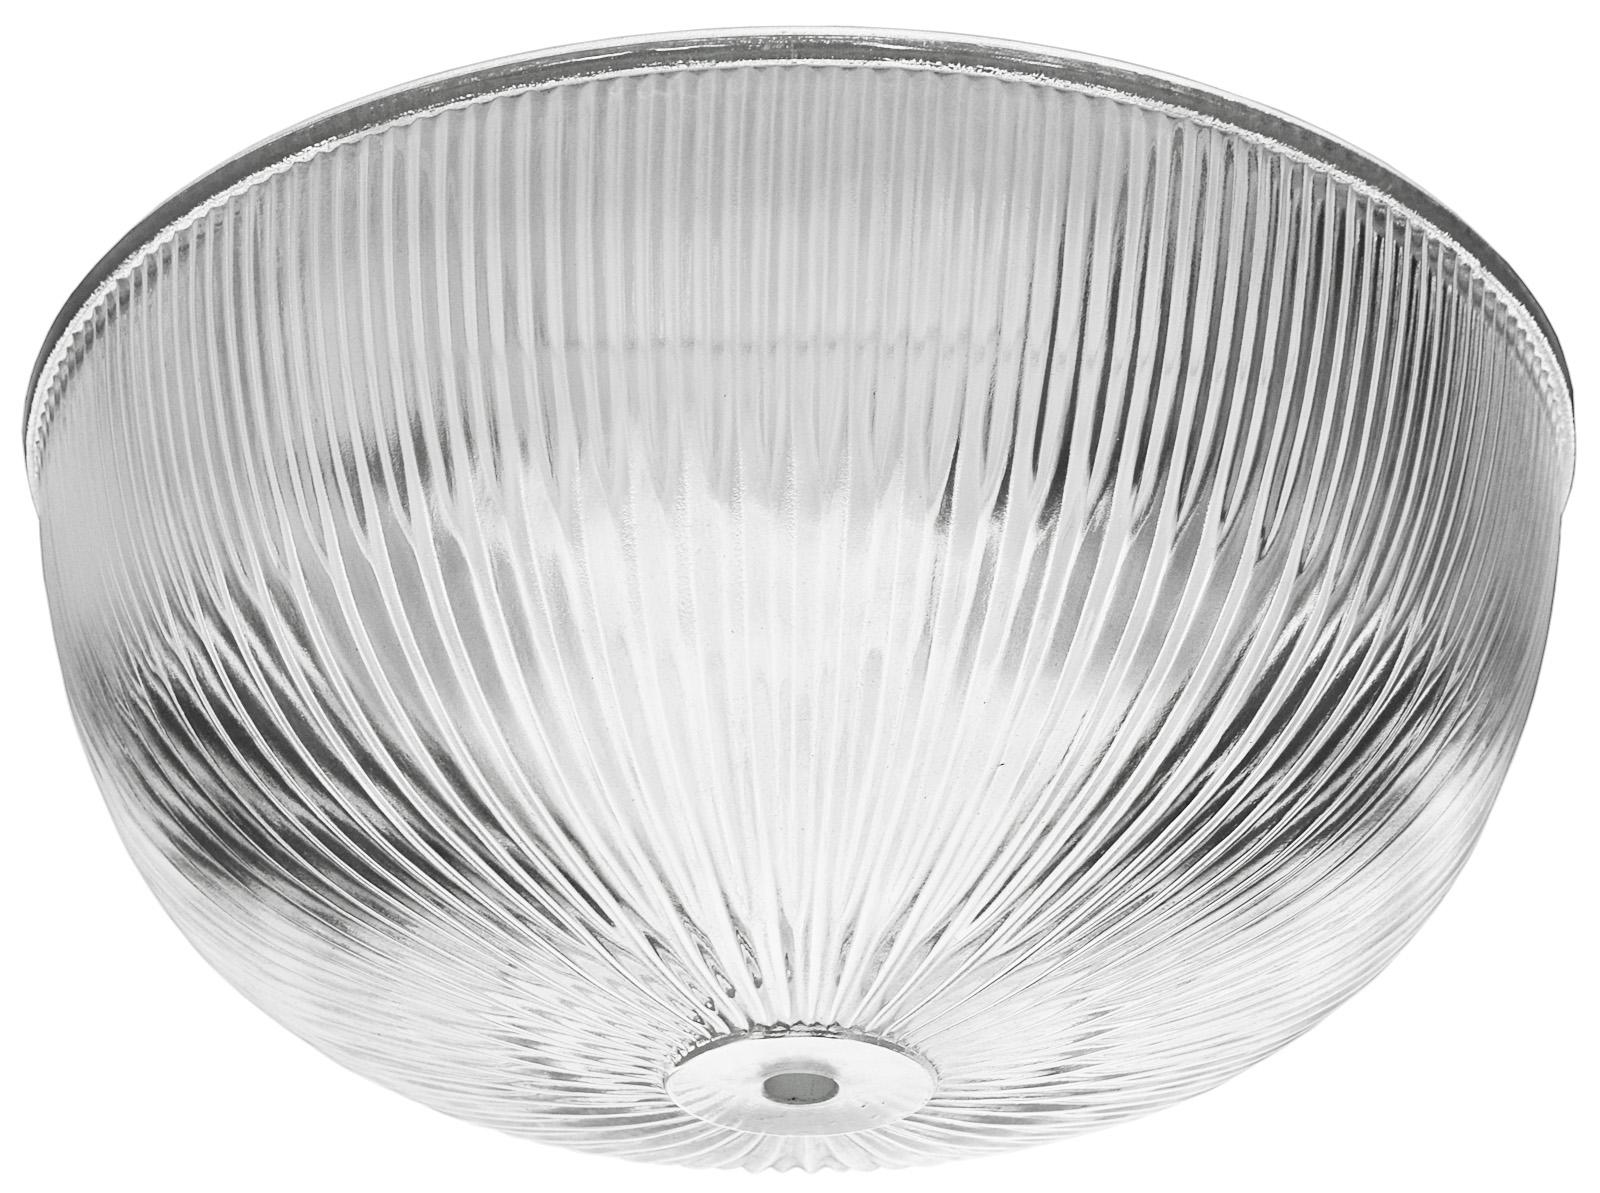 Vintage Recreated Gl Holophane Bowl Shade 0603g